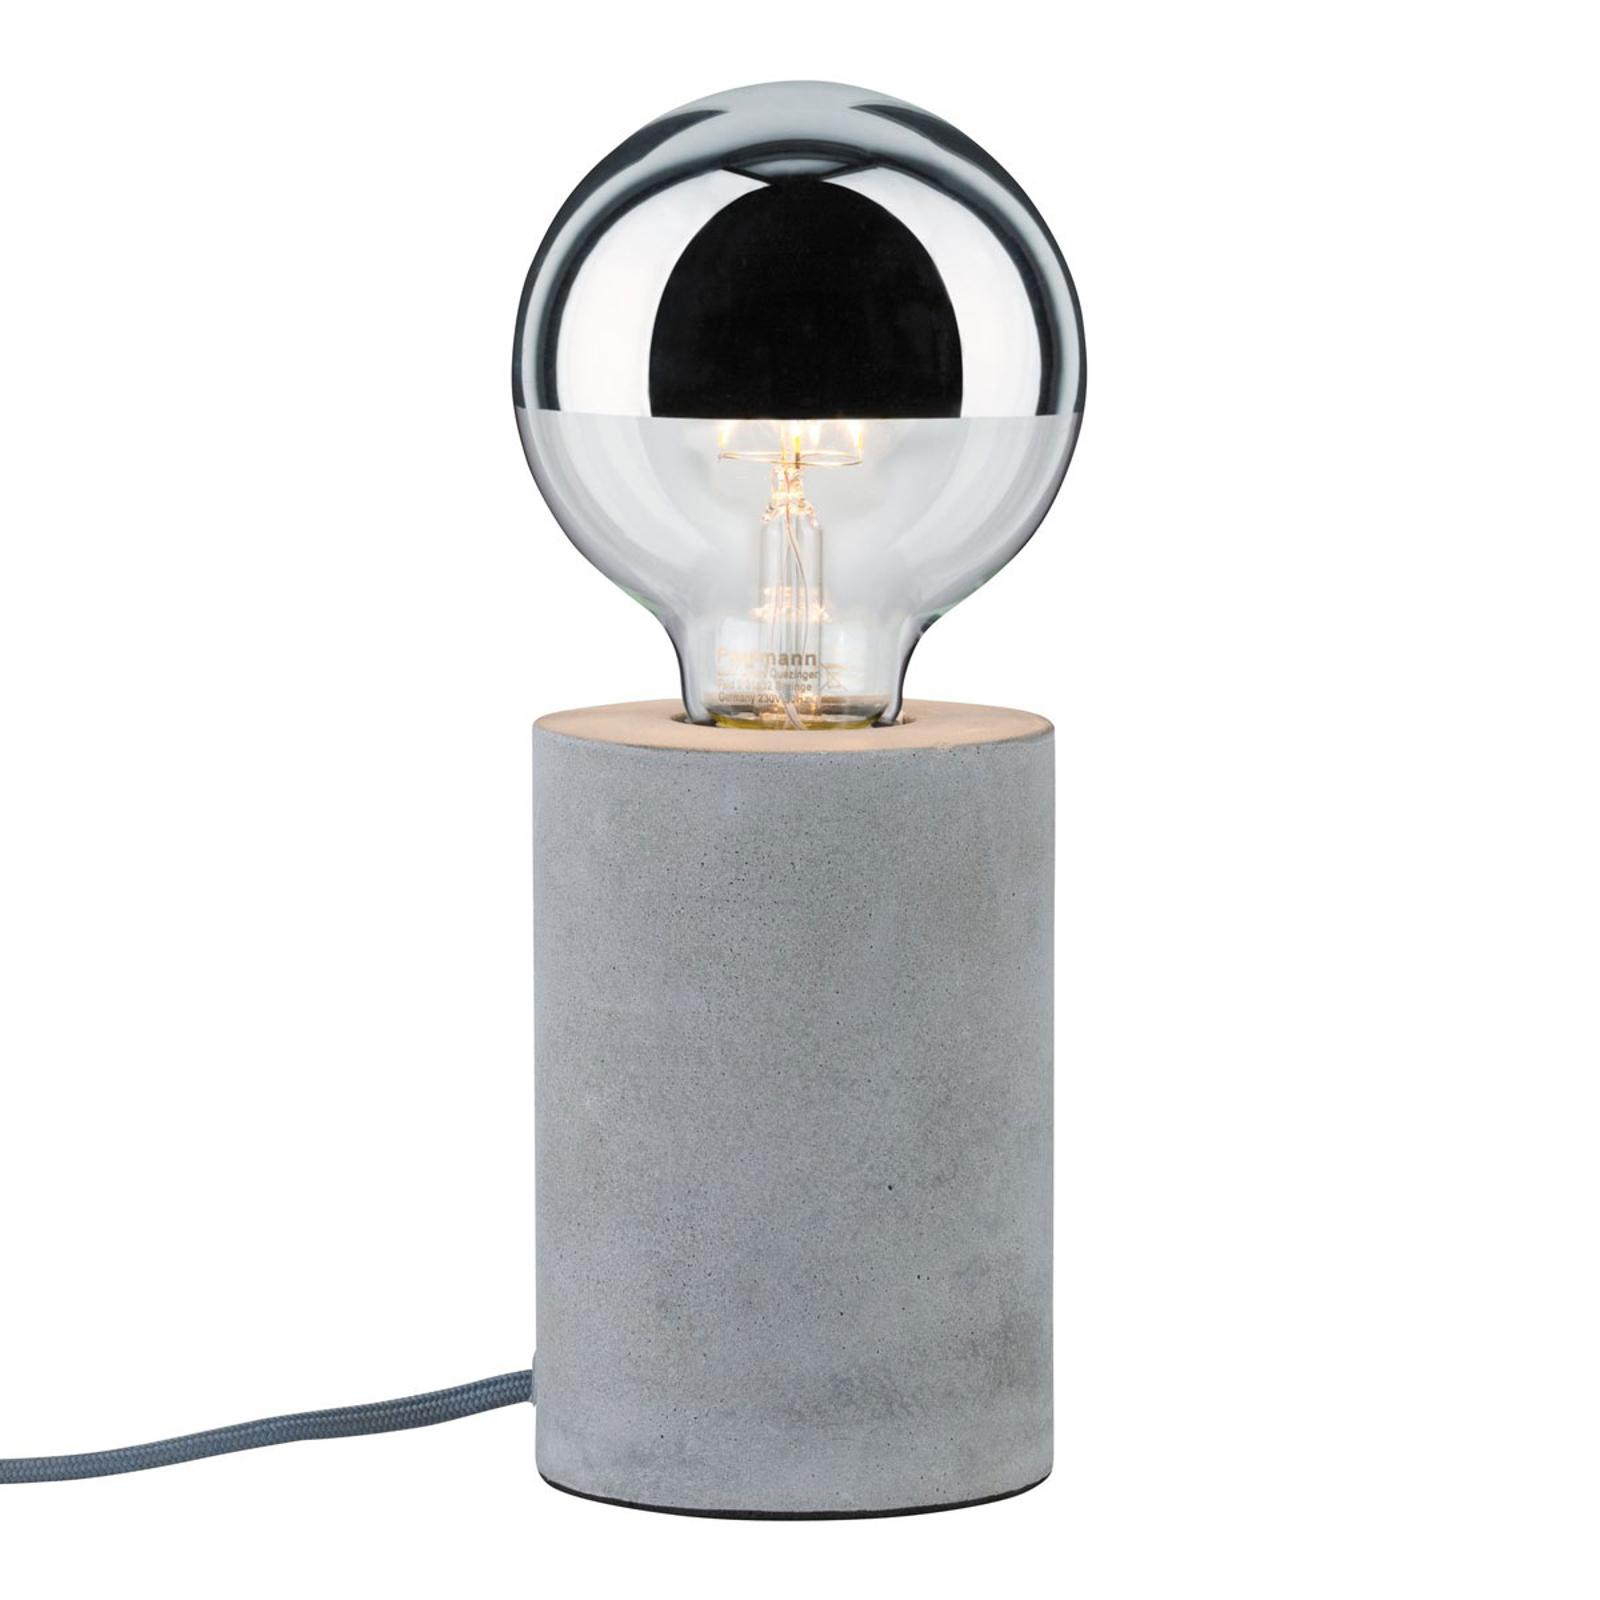 Paulmann Mik bordlampe af beton